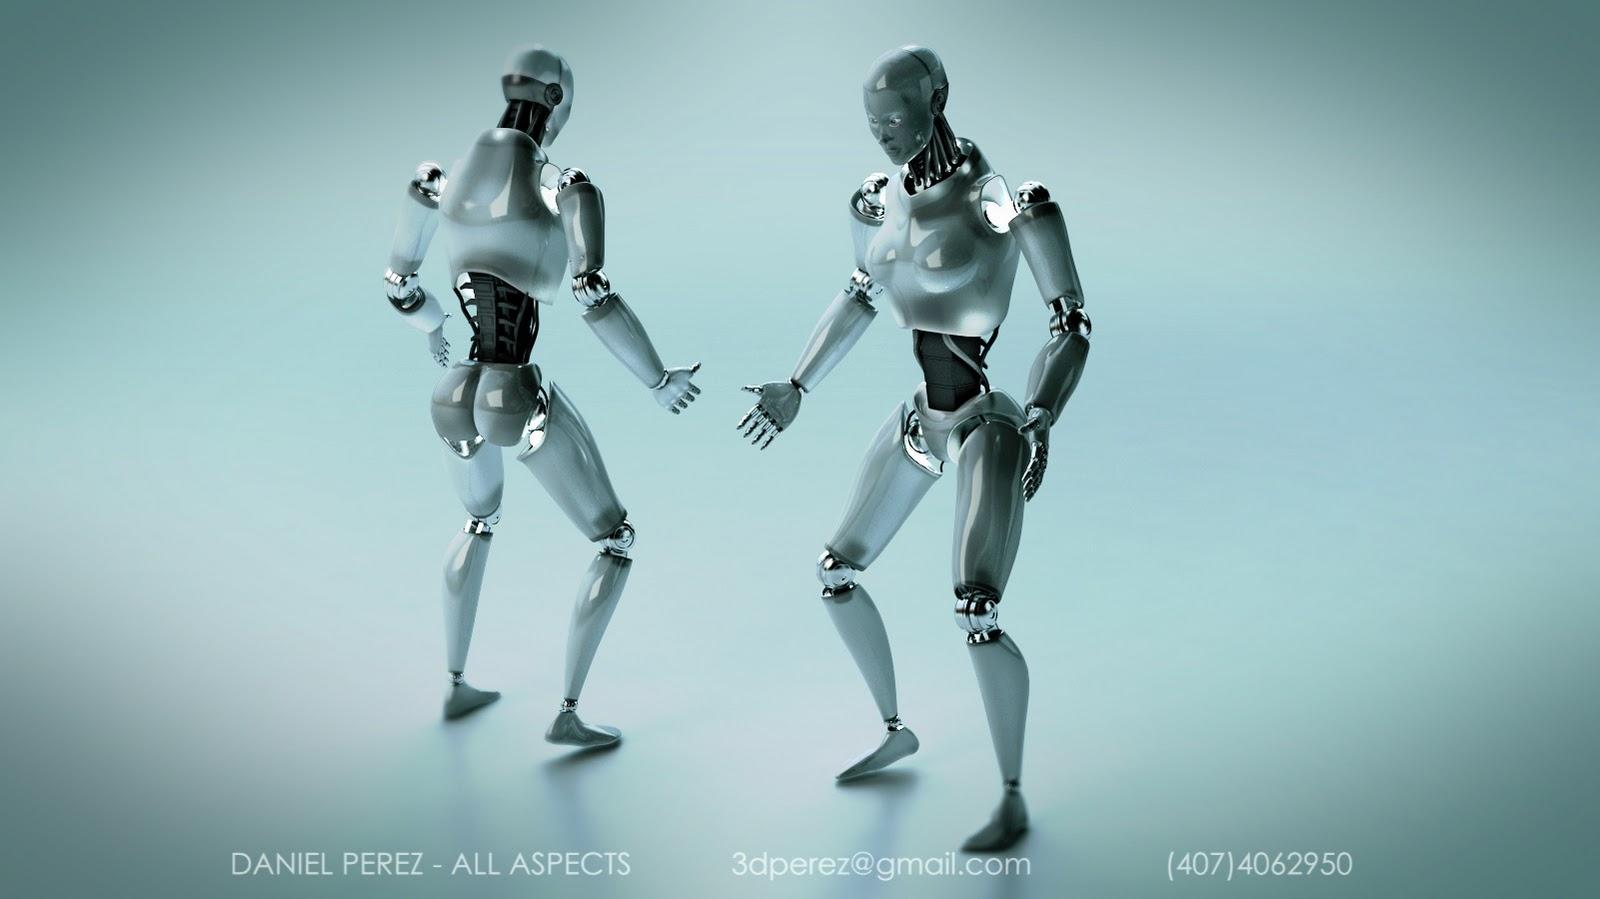 Daniel Perez 3d Artist Humanoid Robot